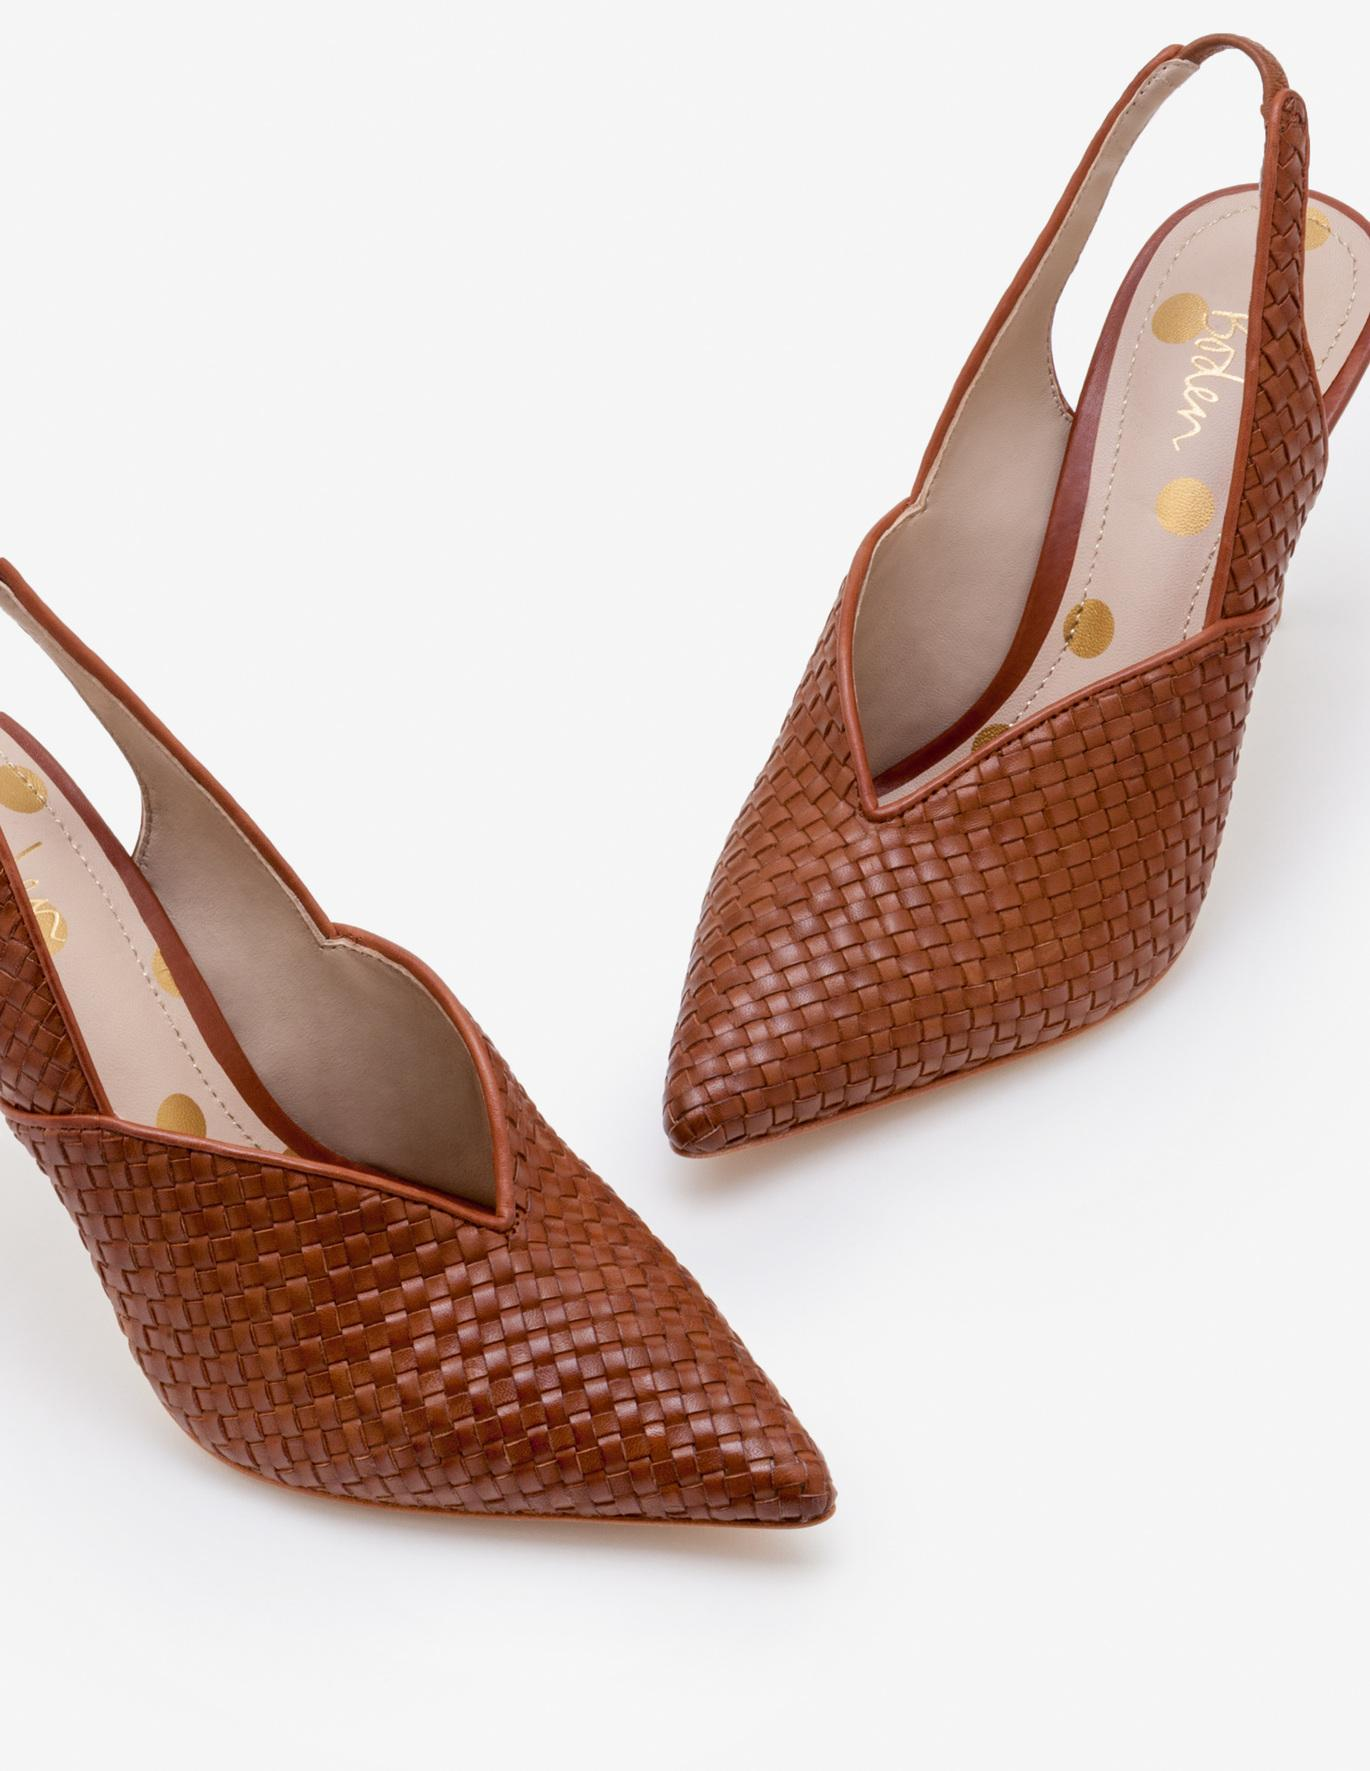 Tan Woven Slingback Heels